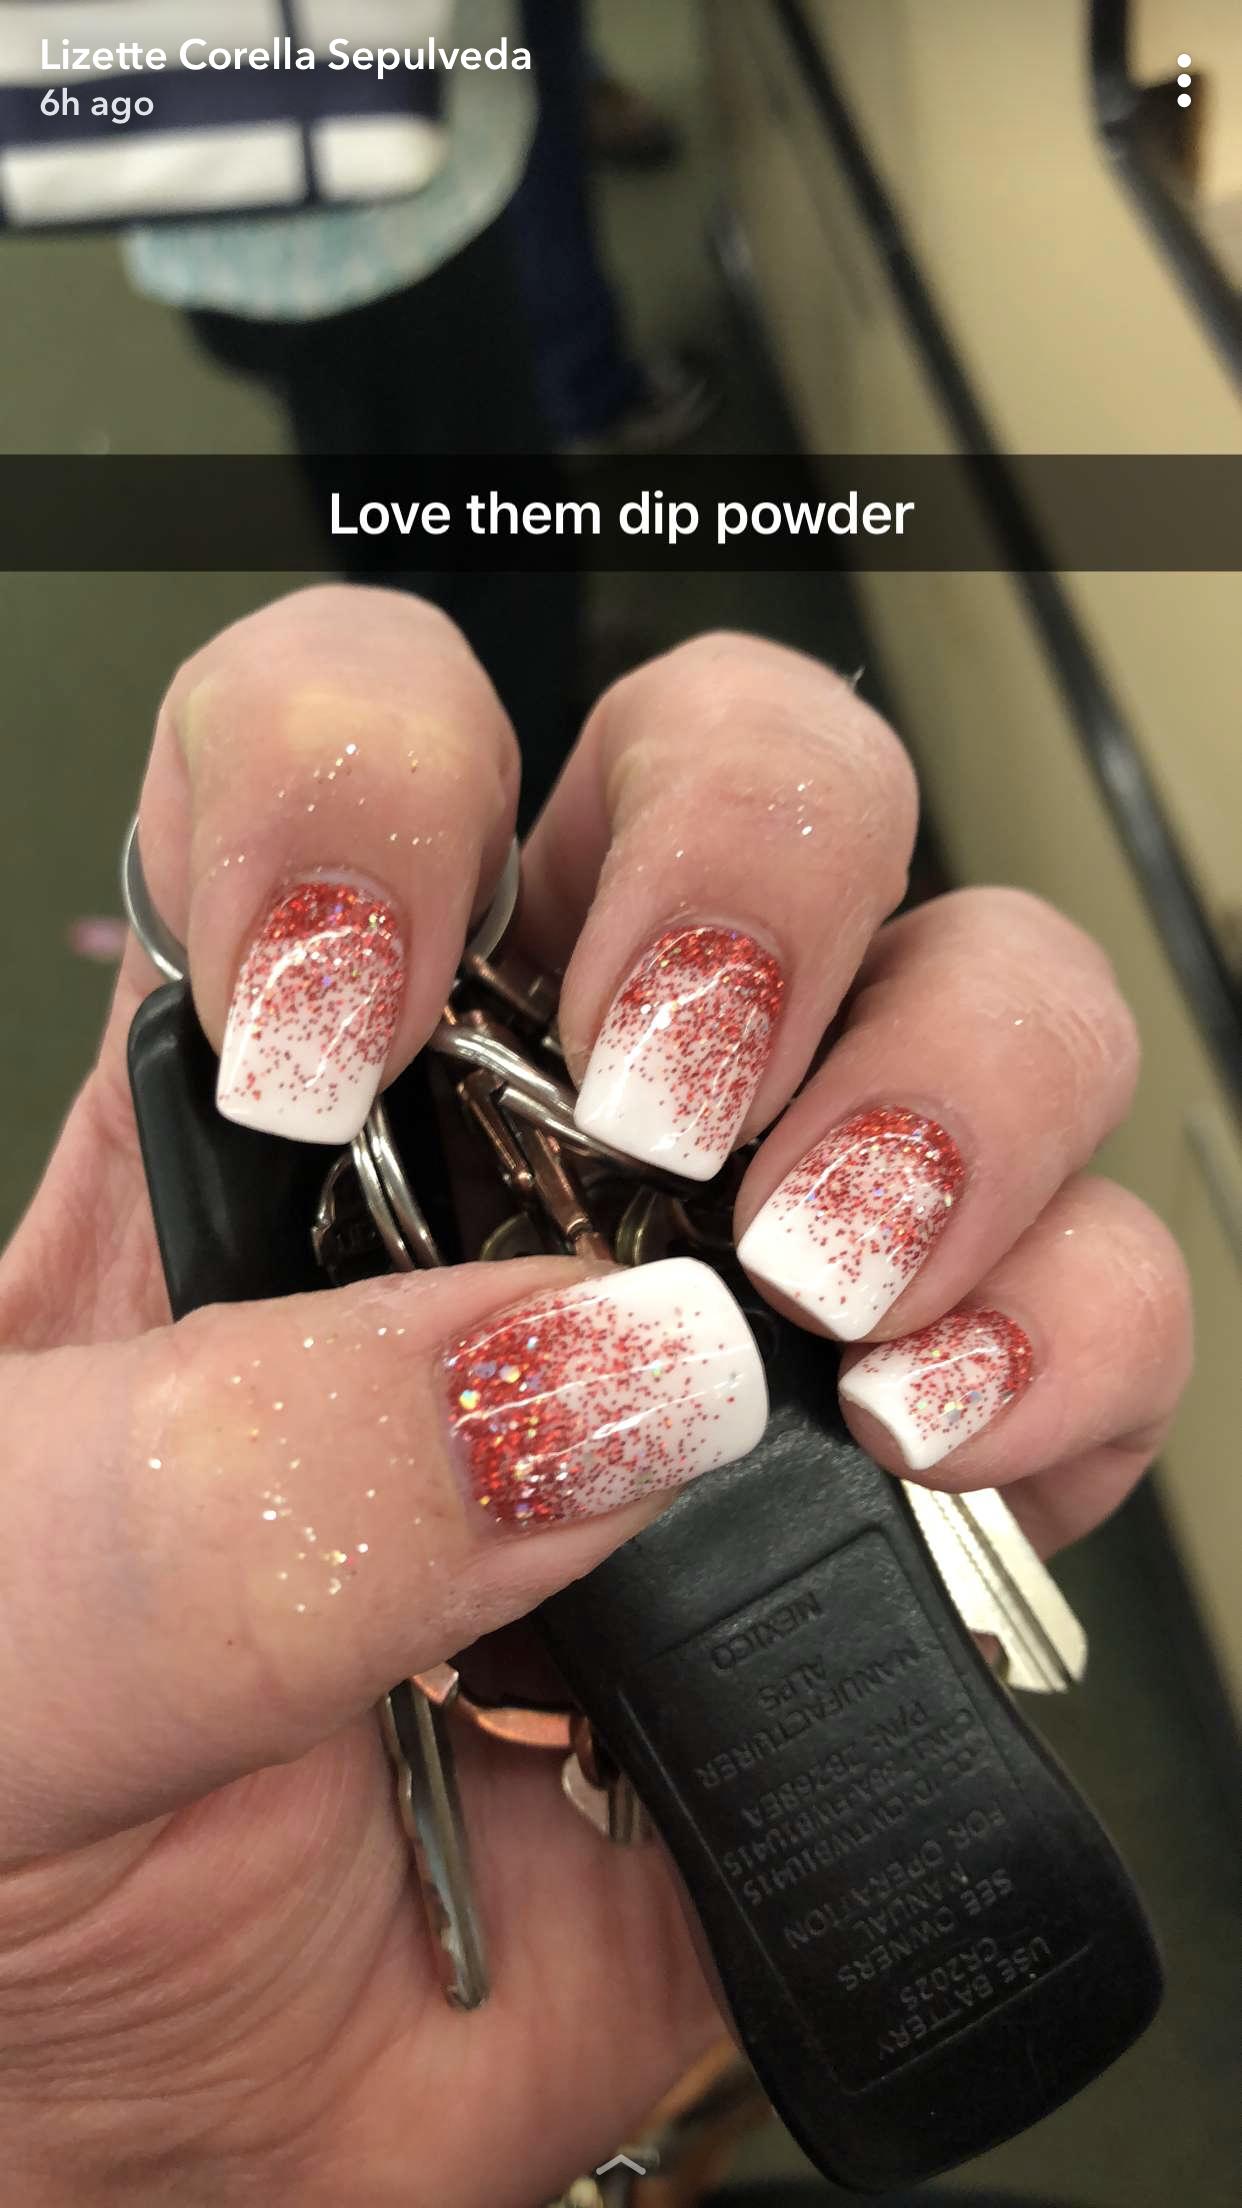 Reverse ombr dip powder | Nail arts in 2018 | Pinterest ...